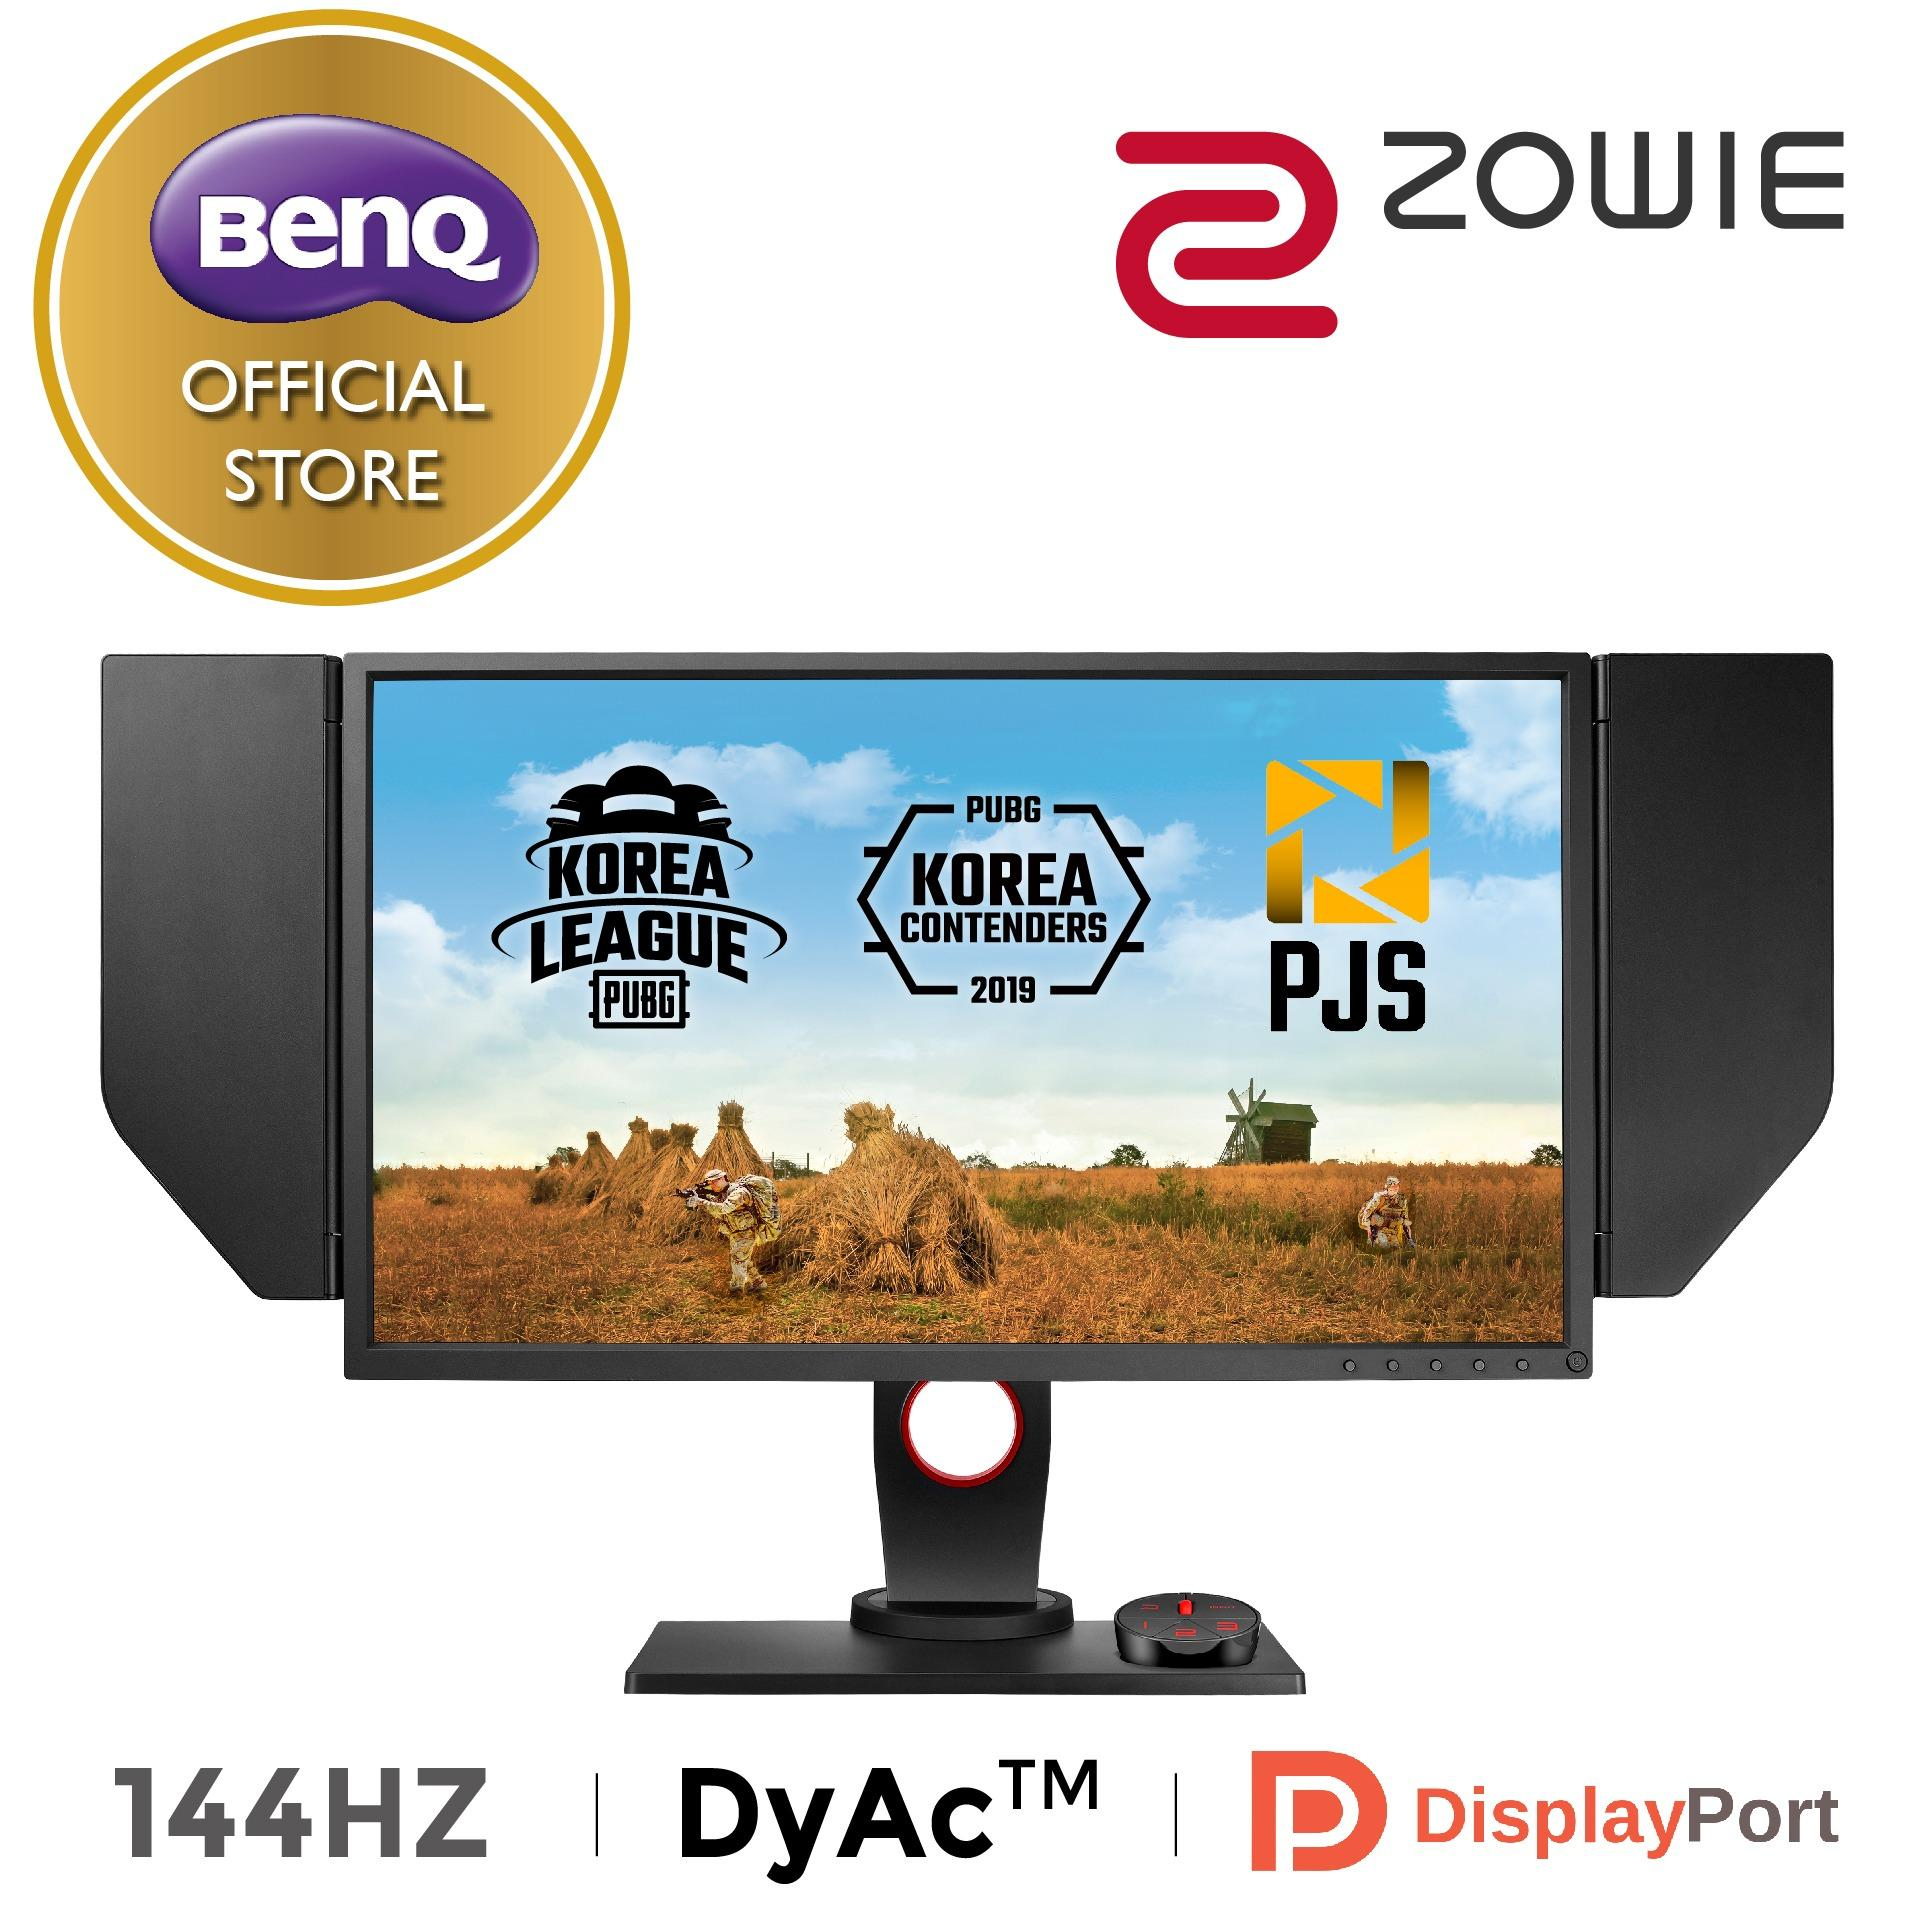 "BenQ ZOWIE XL2536 24.5 inch 24.5"" 144Hz 1ms Exclusive DyAc Technology Esports gaming Monitor ("